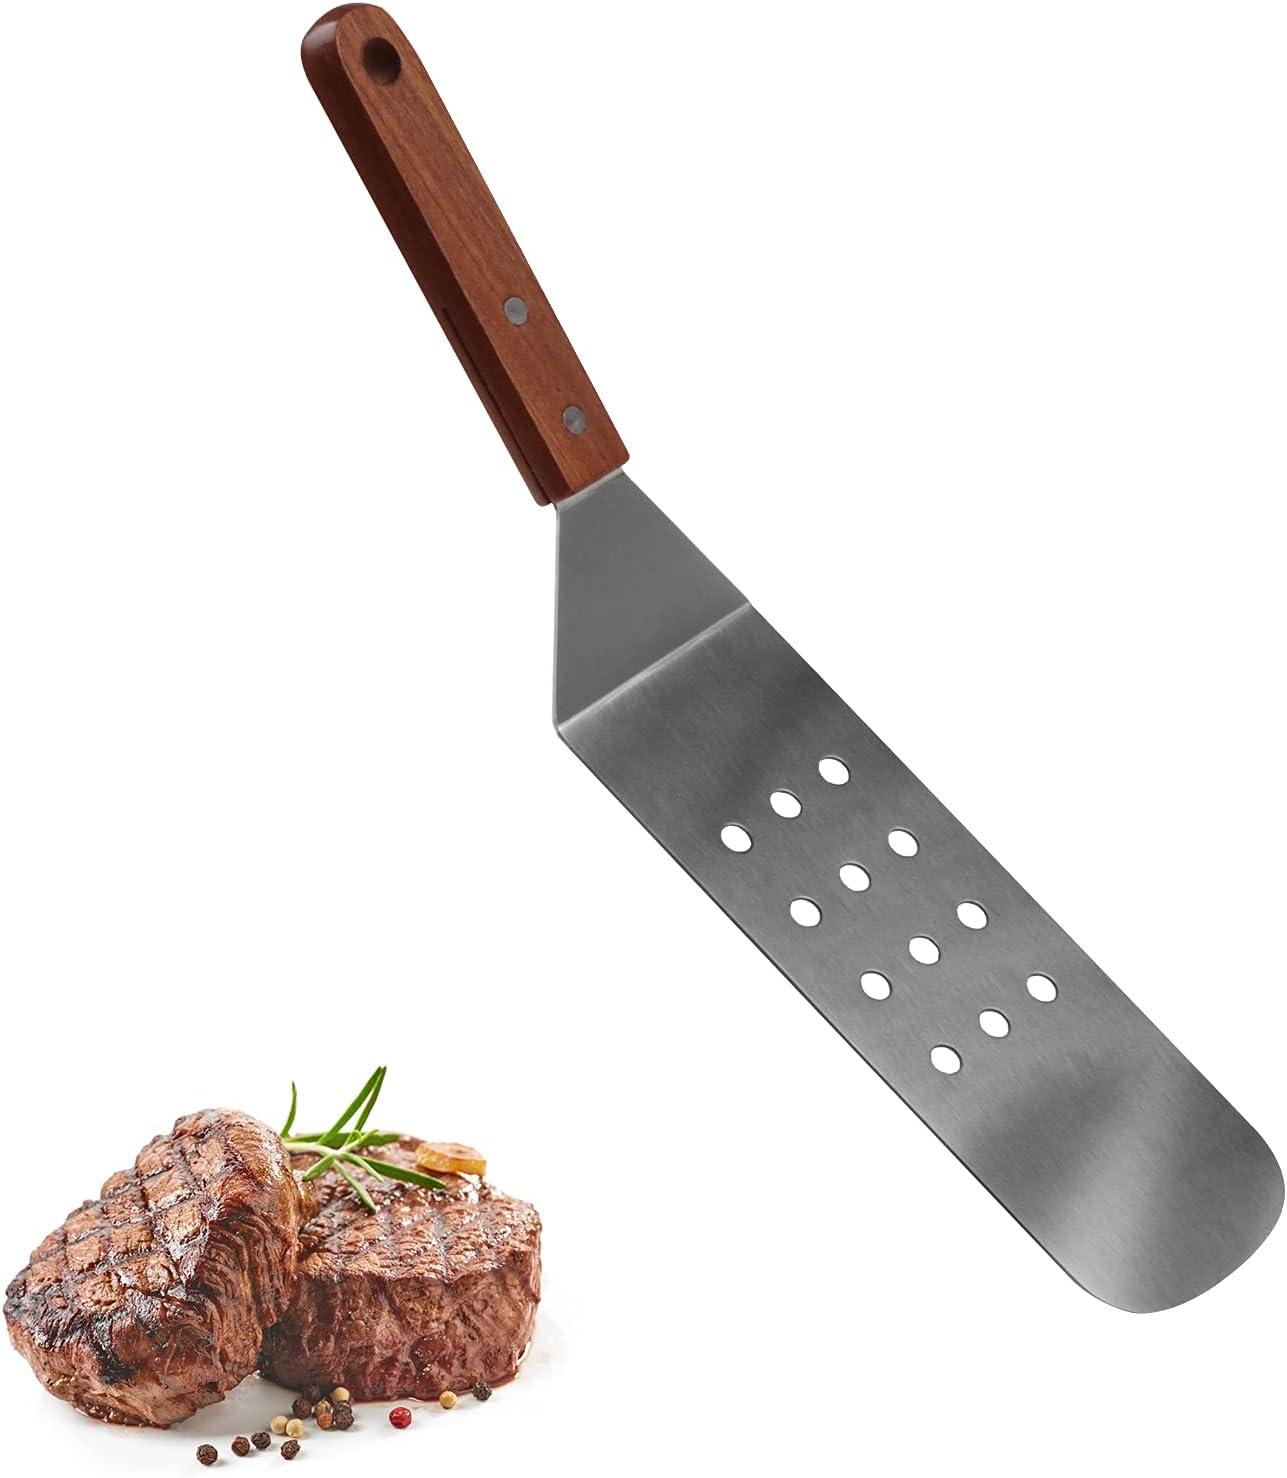 Qinshaine Metal Griddle 2021 spring and Fashionable summer new Spatula Turner Scrape Hamburger